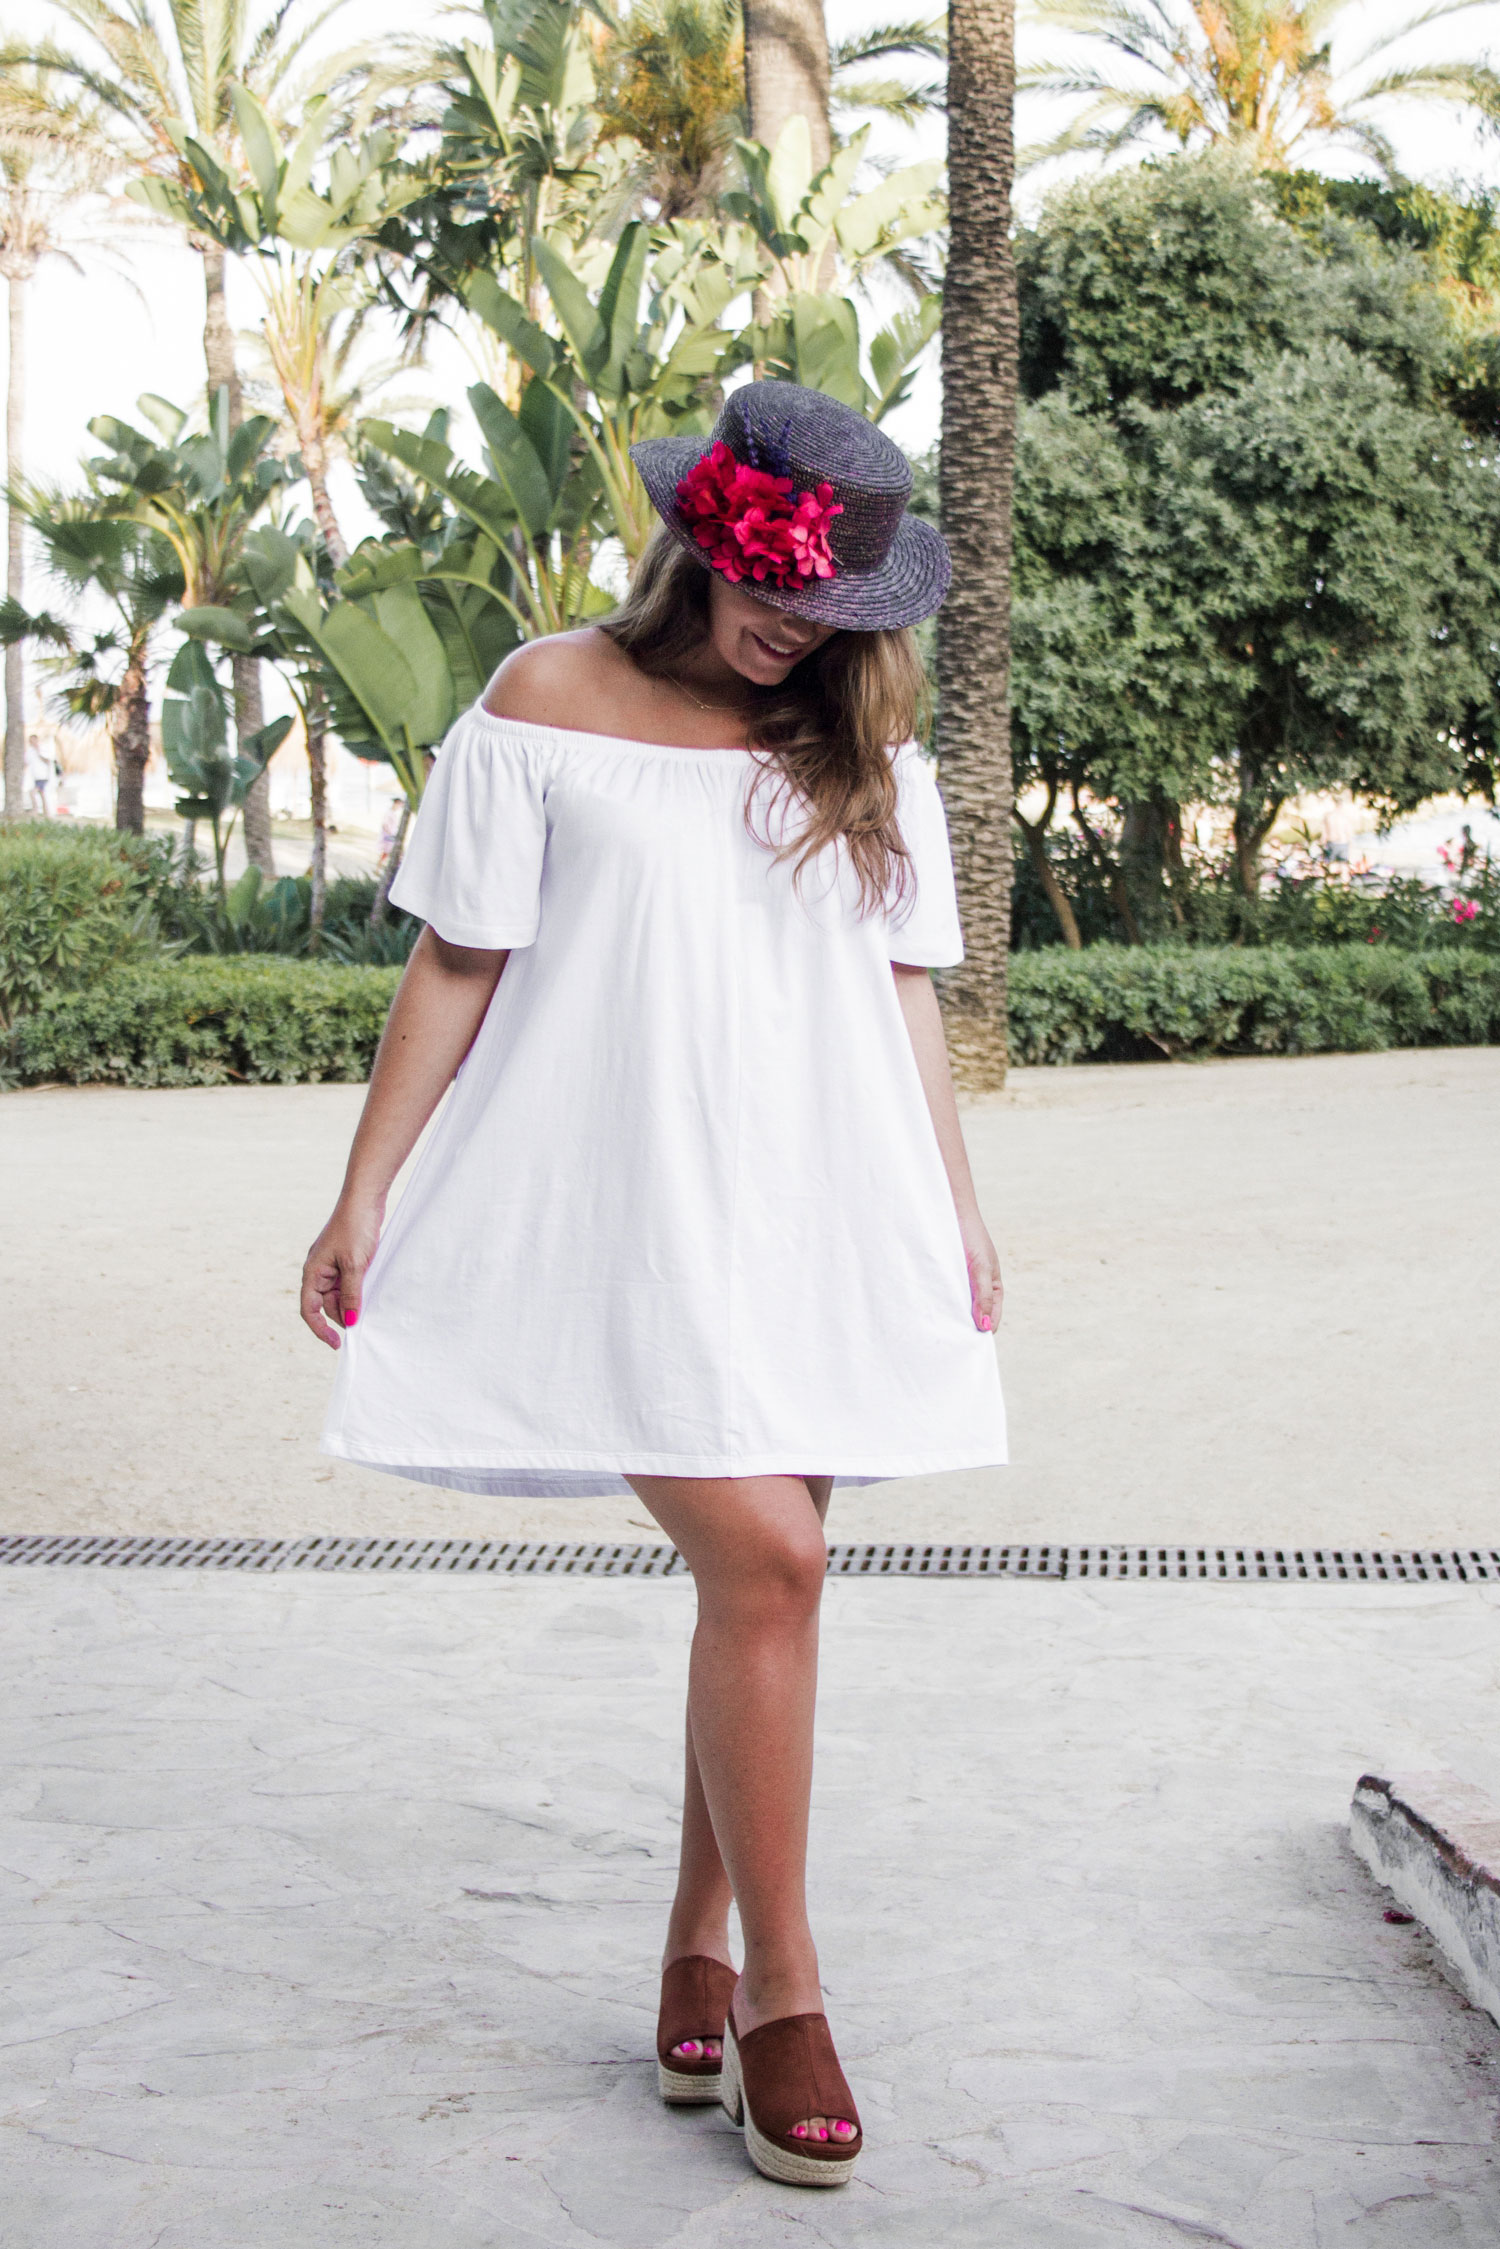 madeinstyle_canotier_sombrero_paja_le_manin_summer_hat-19